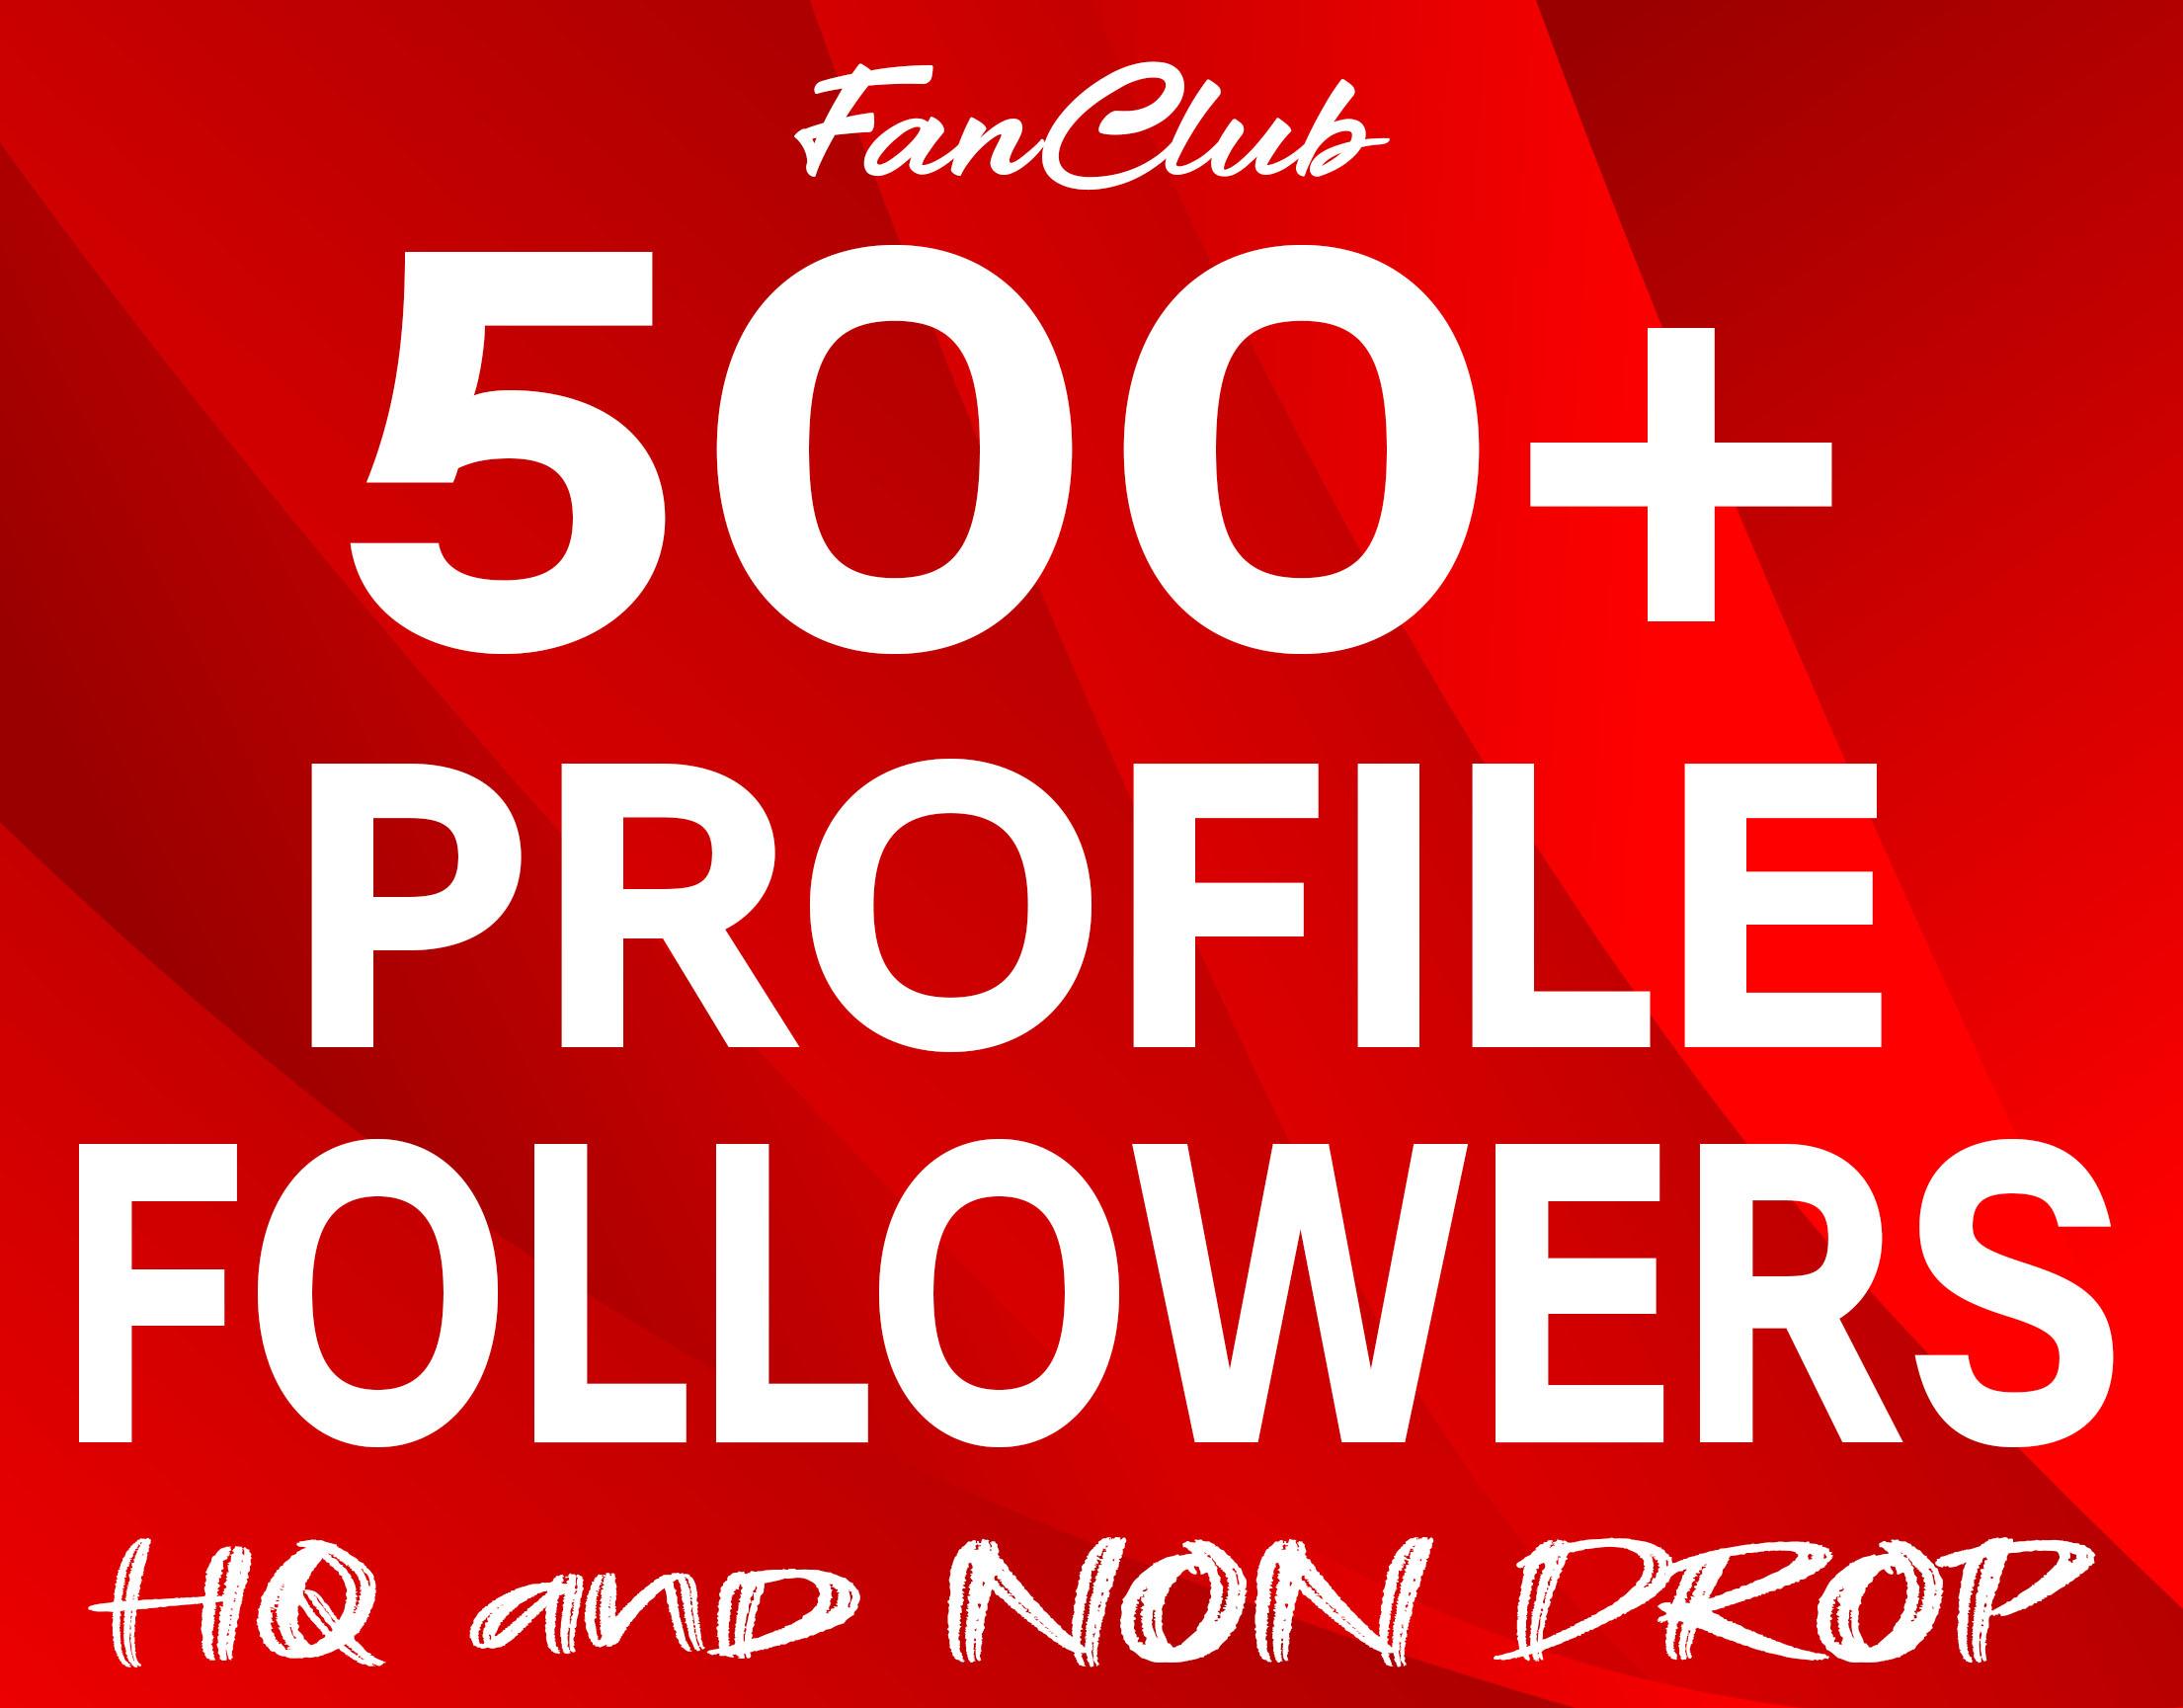 Add 500+ Profile Followers High Quality & Non Drop Service